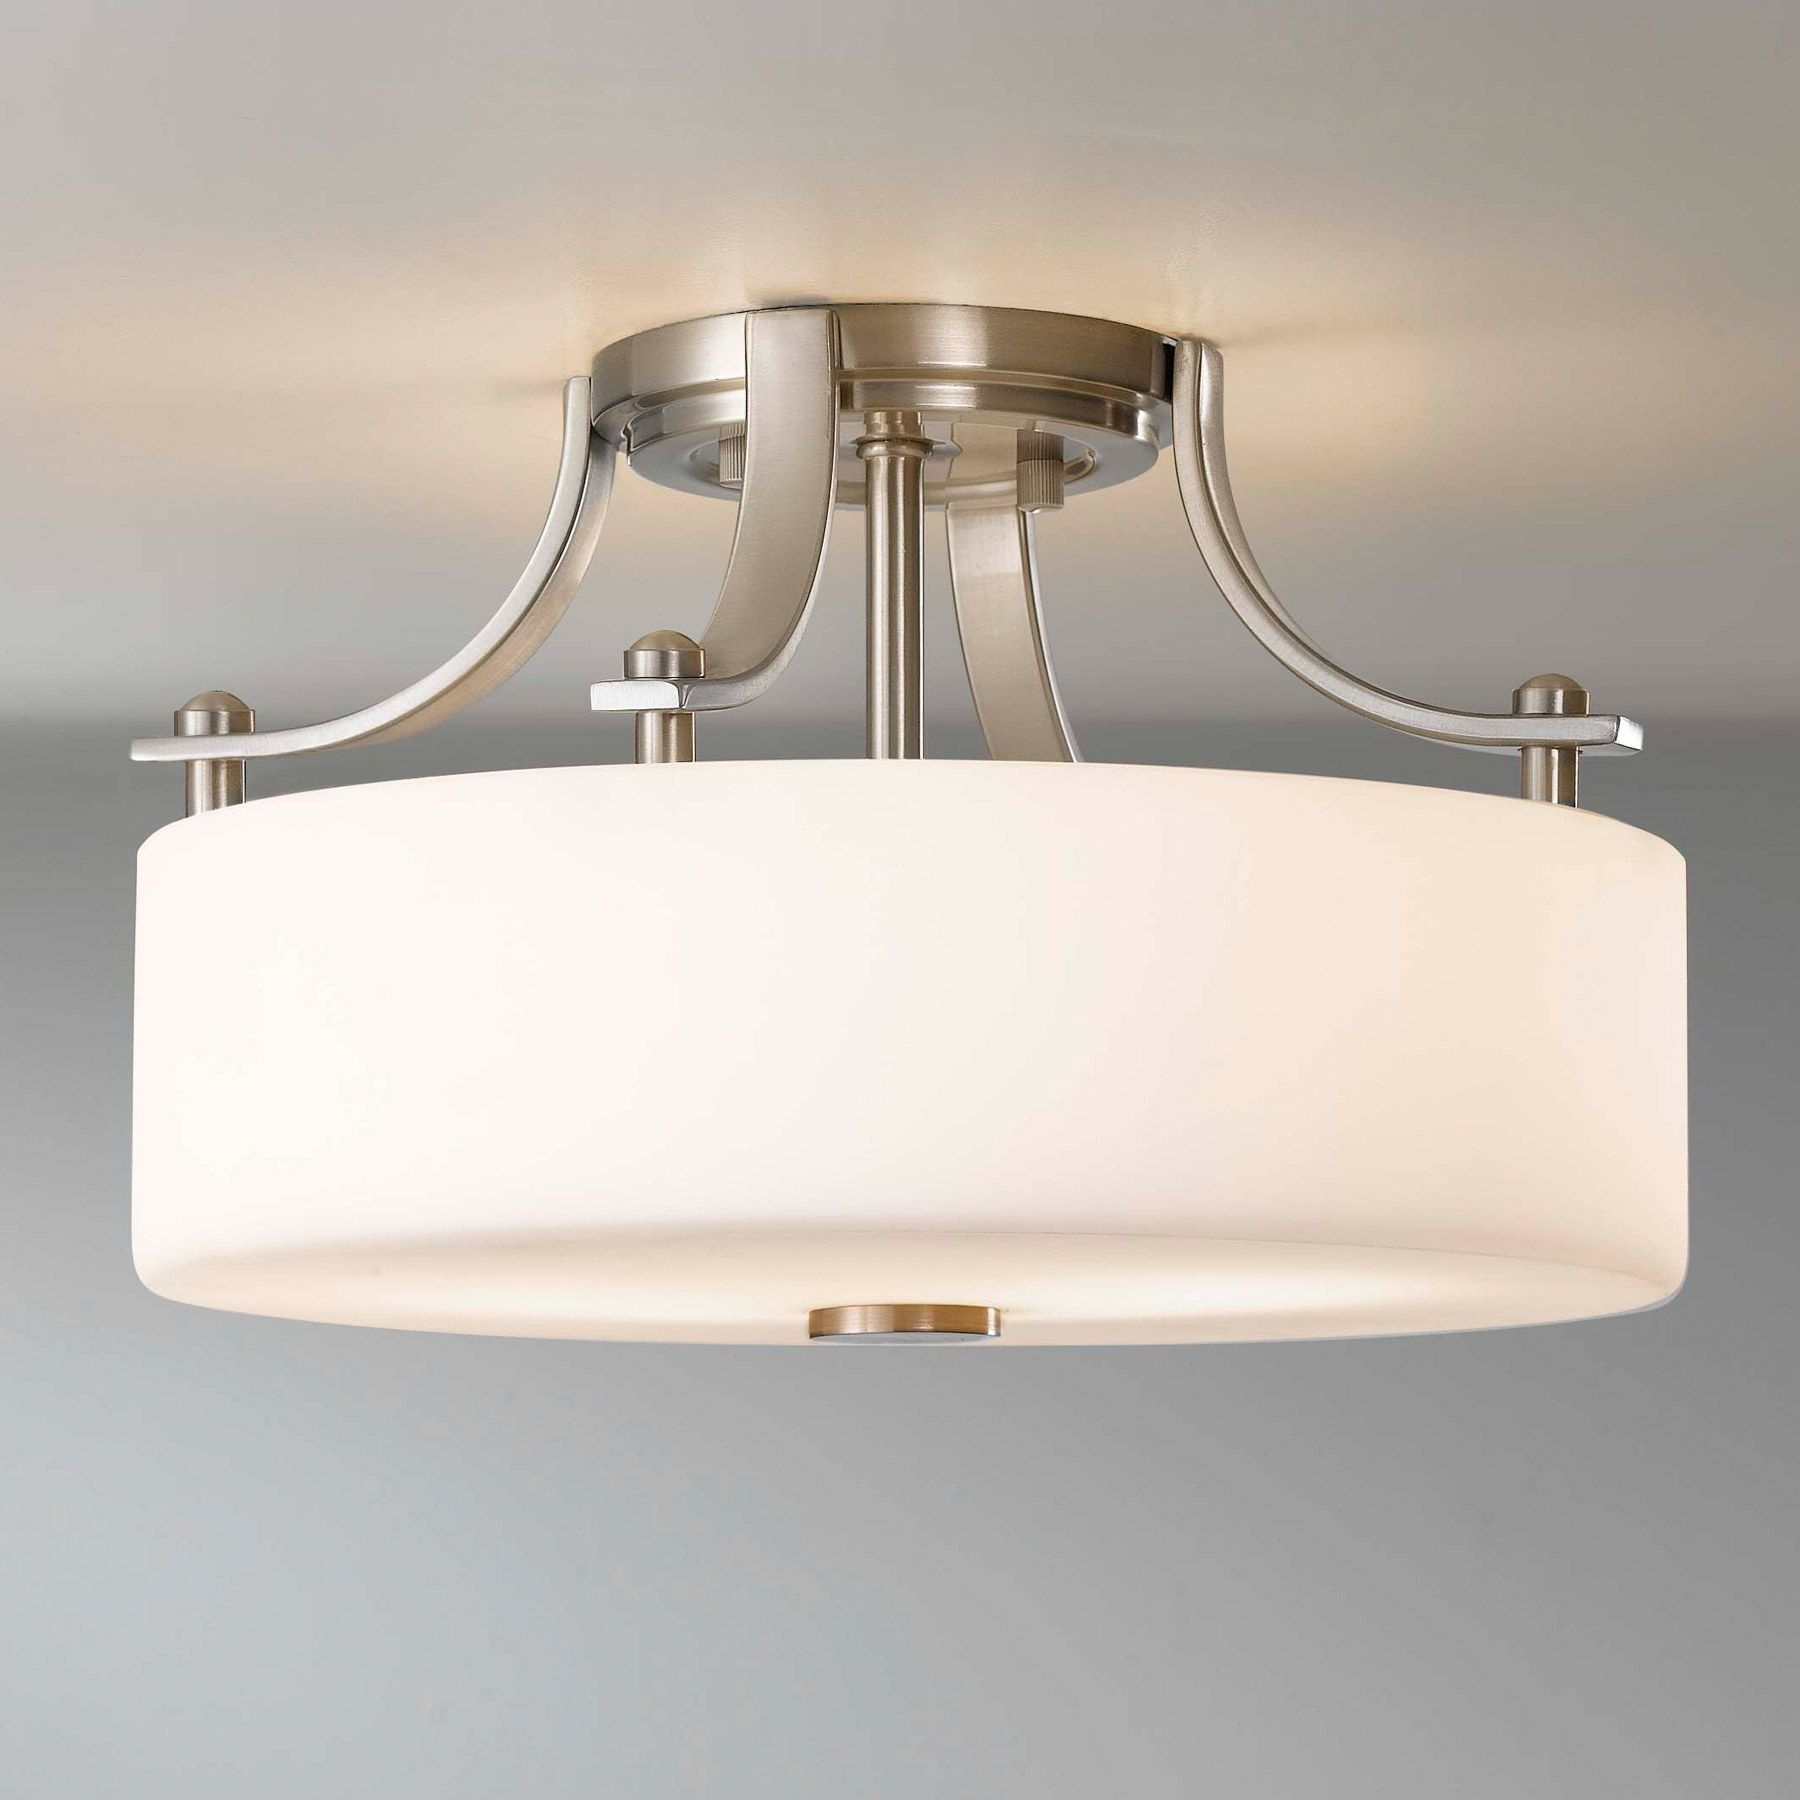 White Flushmount Light Fixture